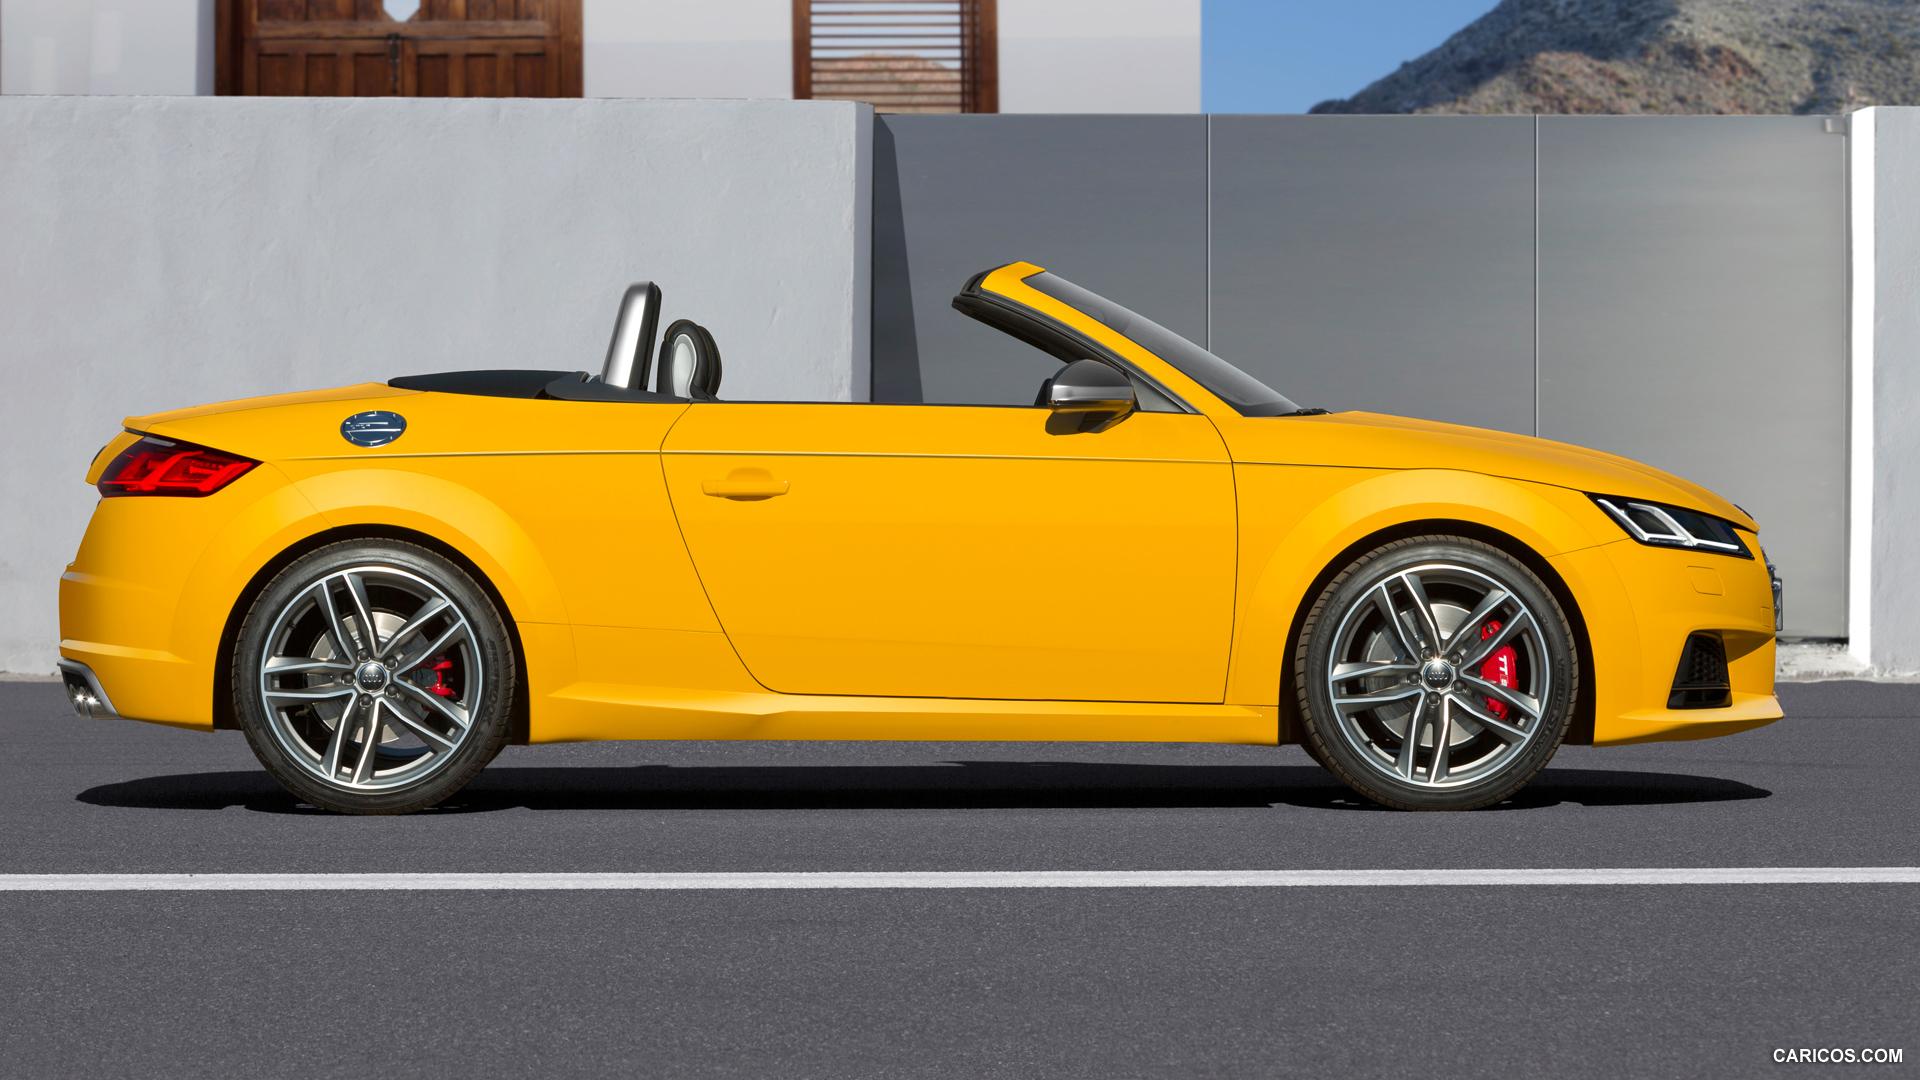 audi tt roadster yellow sides